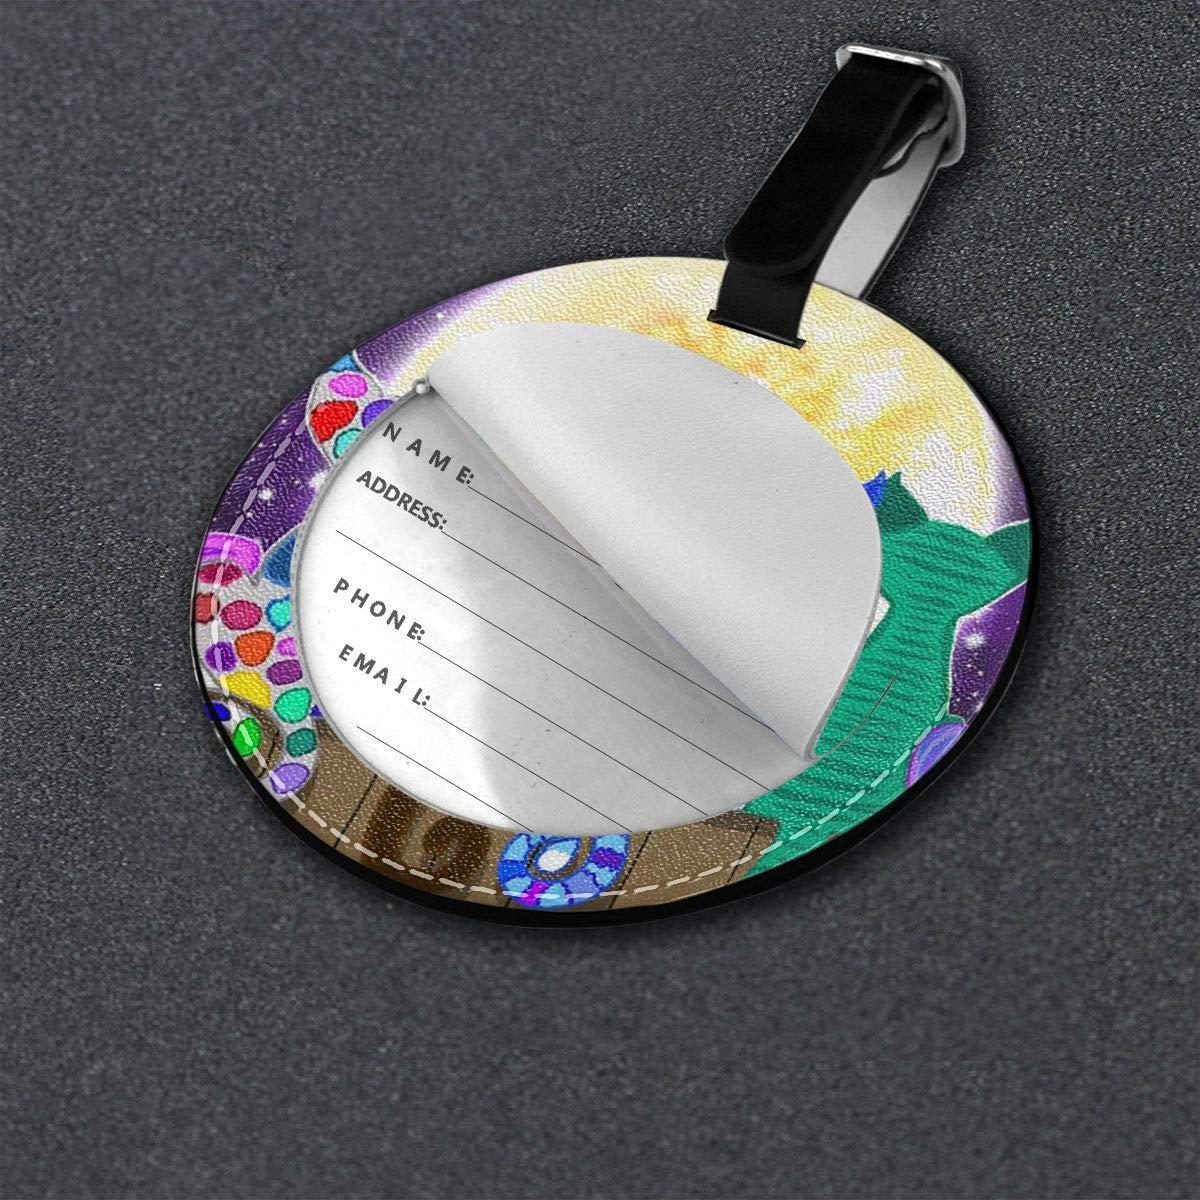 Free-2 Moon Shadow Meow Luggage Tag 3D Print Leather Travel Bag ID Card